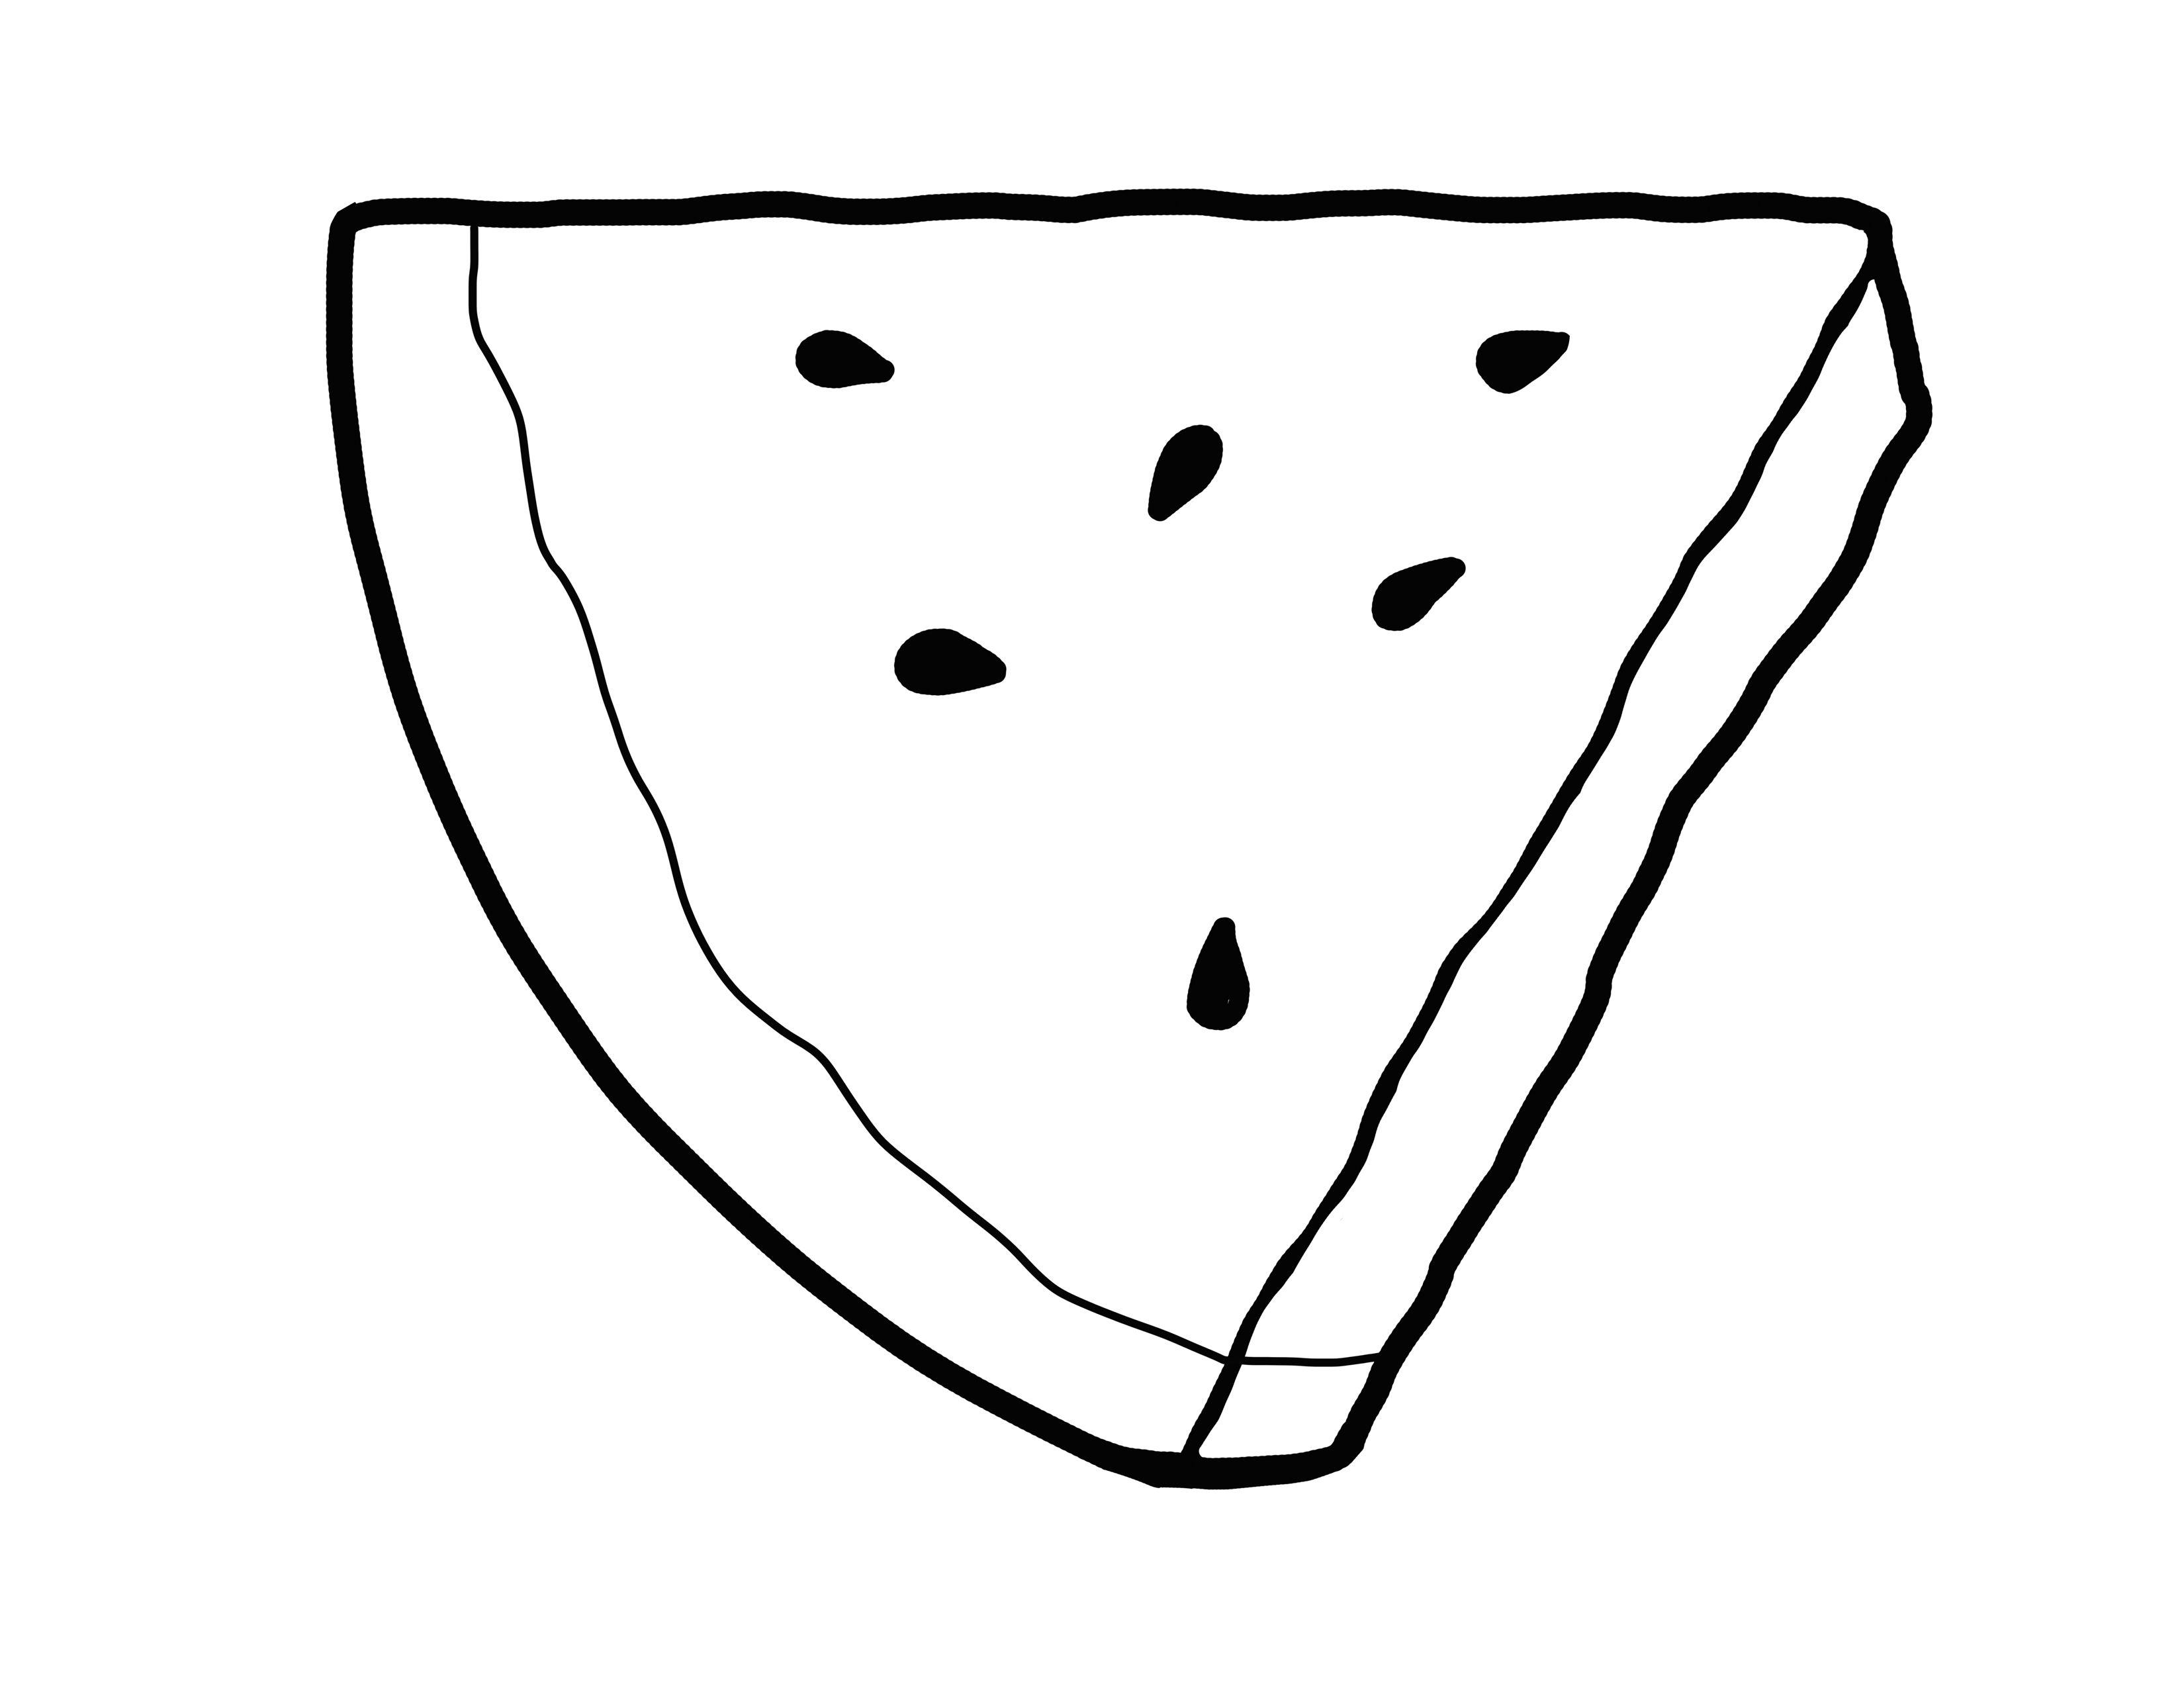 Watermelon Illustration Outline Bullentinboards